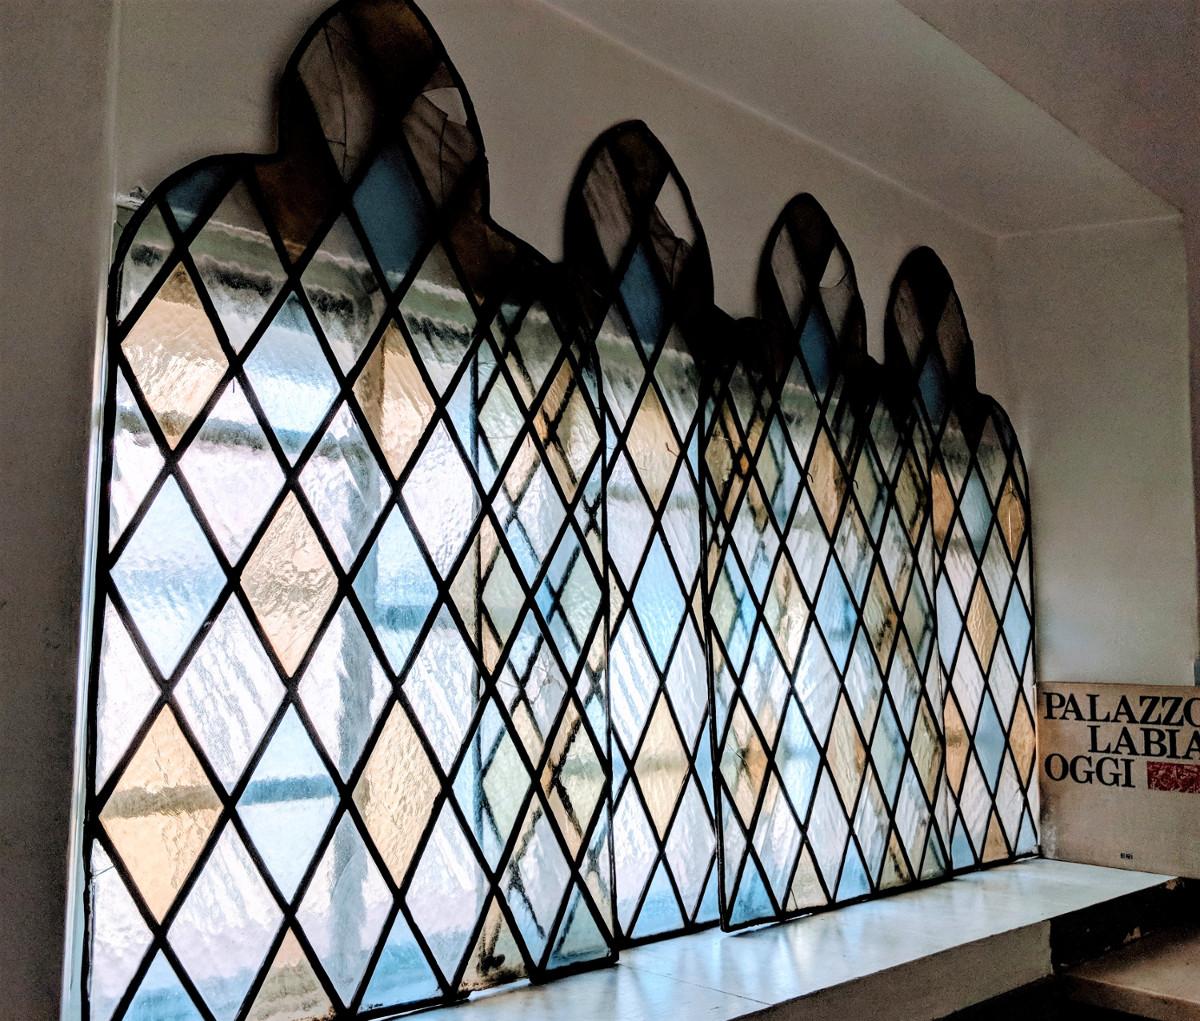 99 stairs villa ama sicily.jpg